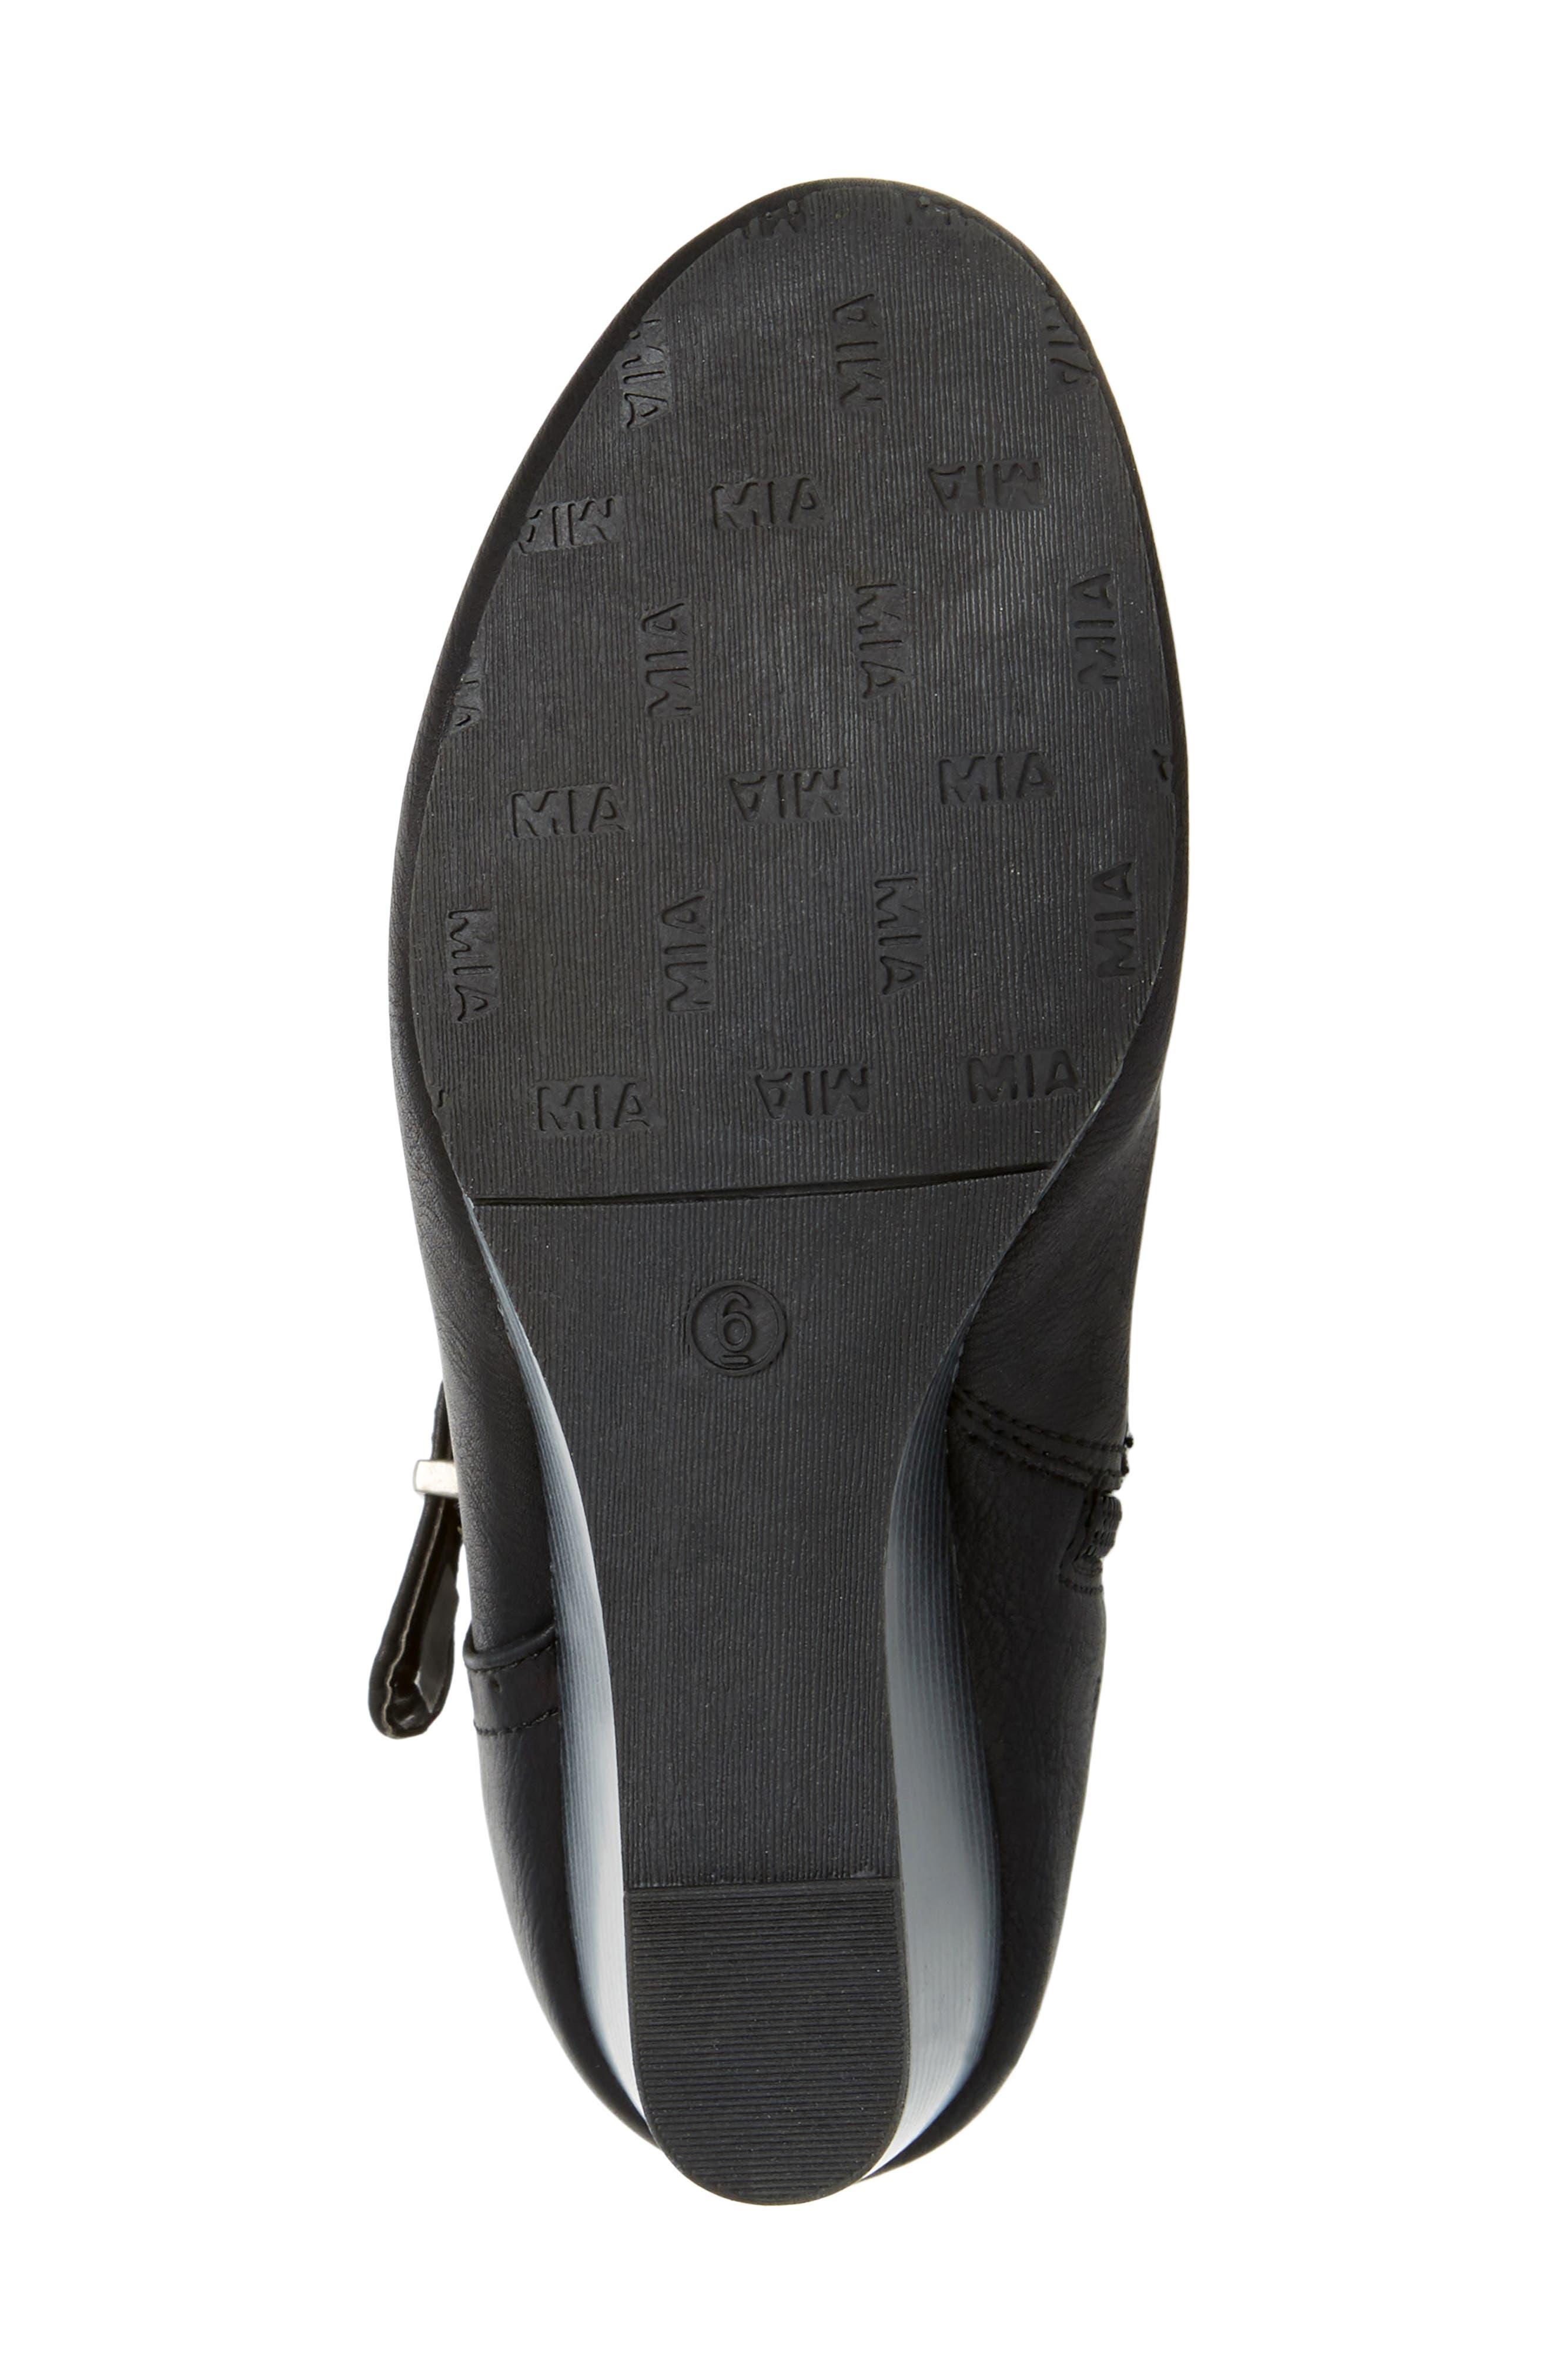 Claretta Knee High Wedge Boot,                             Alternate thumbnail 6, color,                             BLACK VEGAN LEATHER